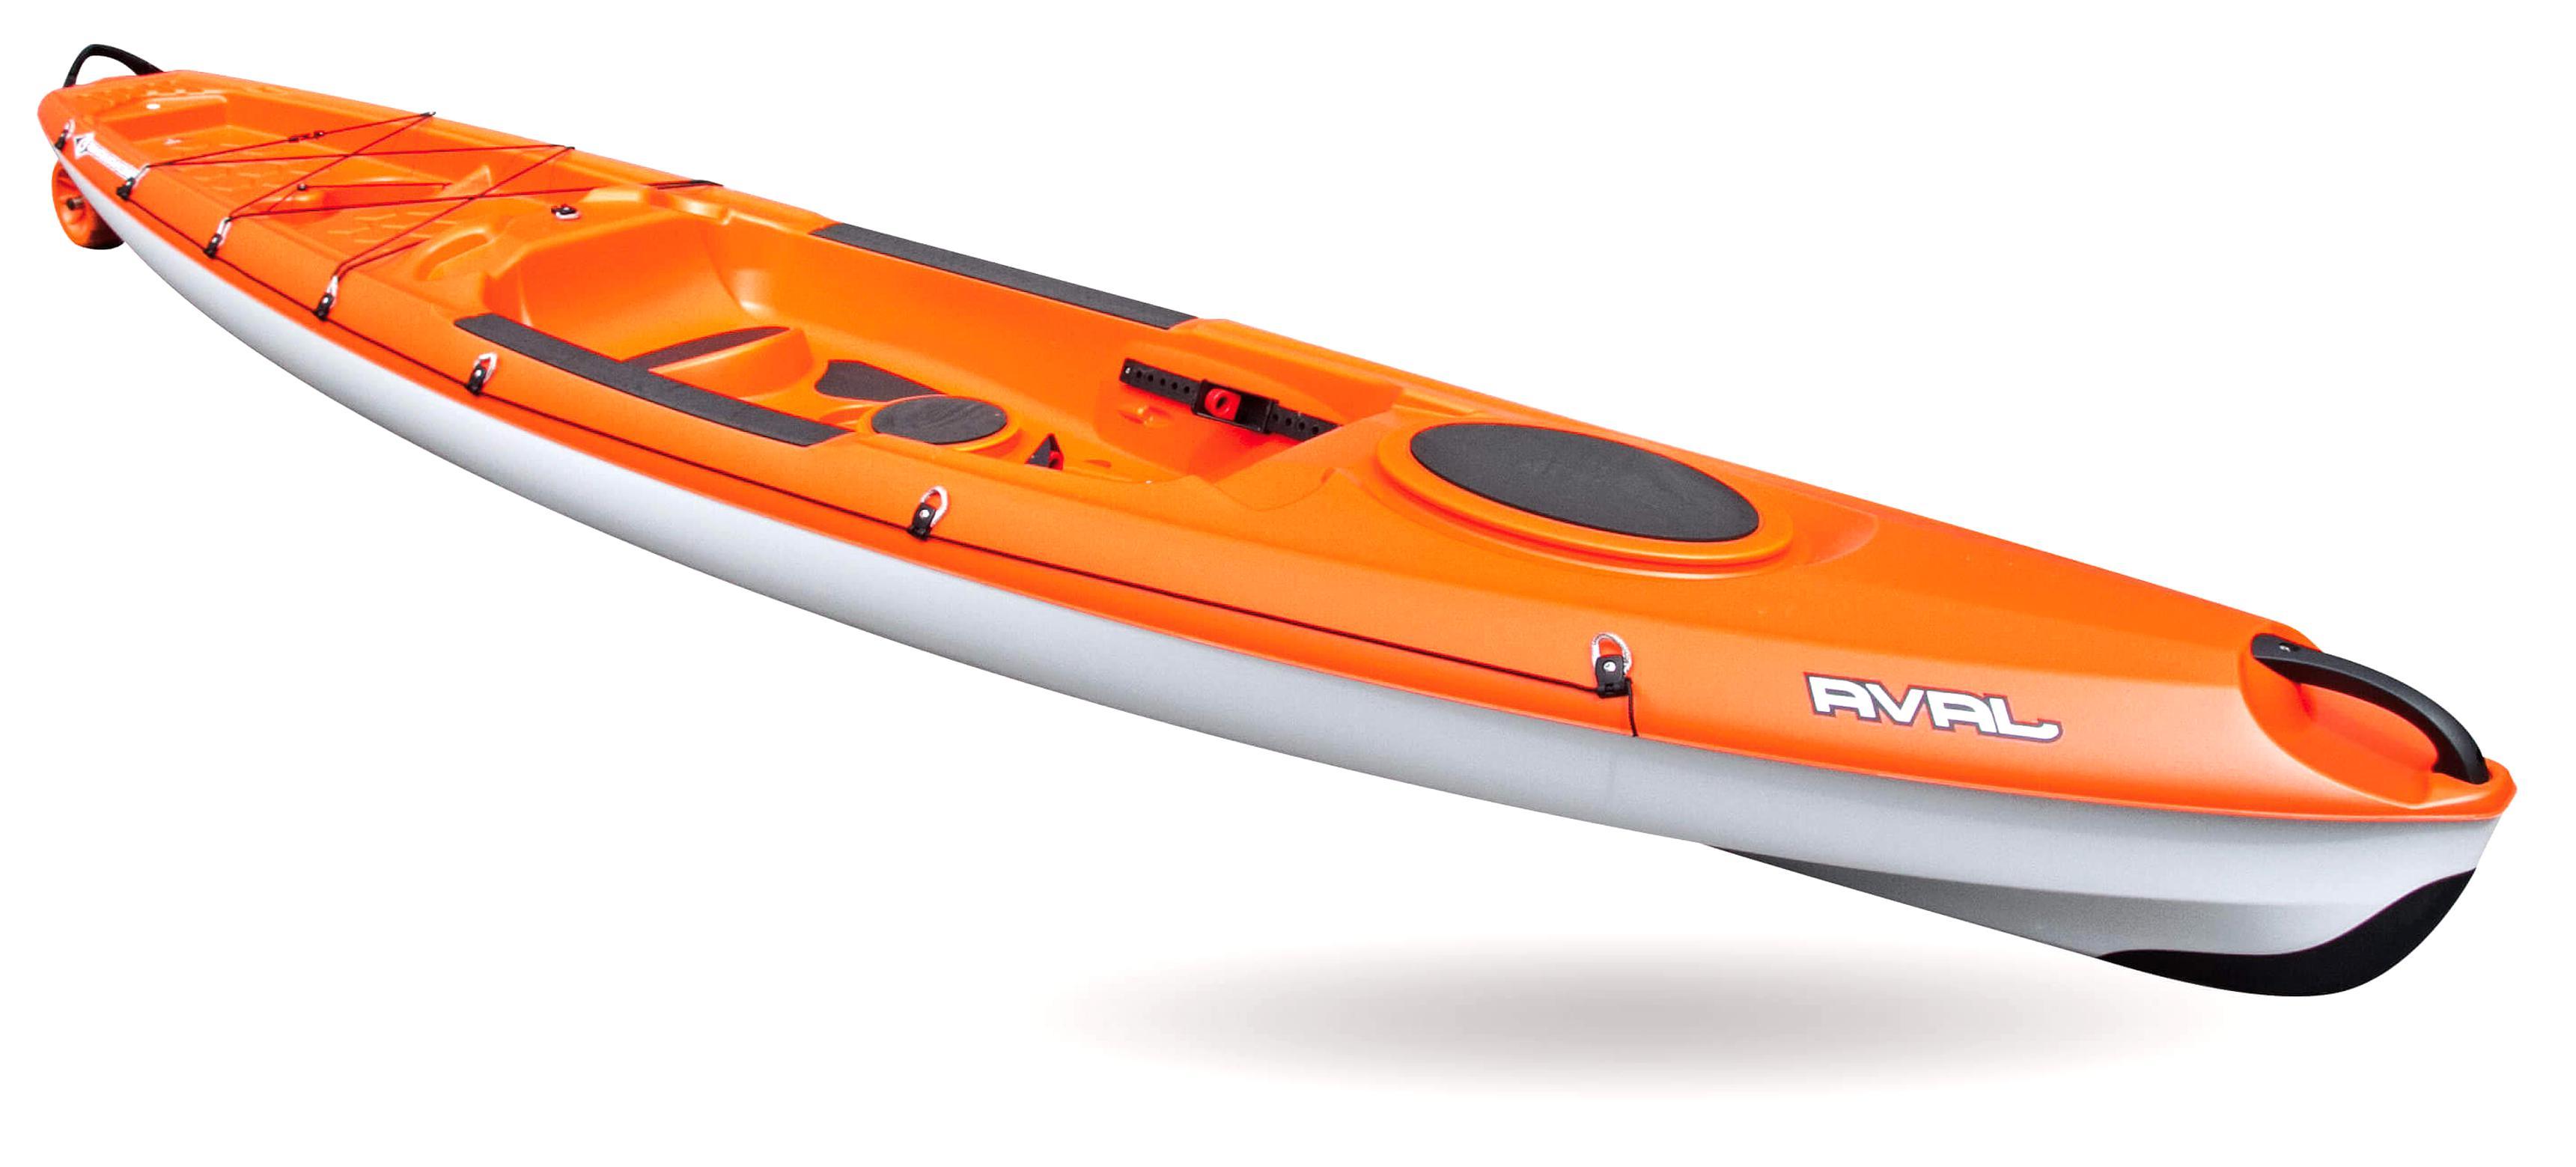 Manto Abrasivo Face Para Cima Kayak De Peche A Vendre Amazon Tatosbotao Com